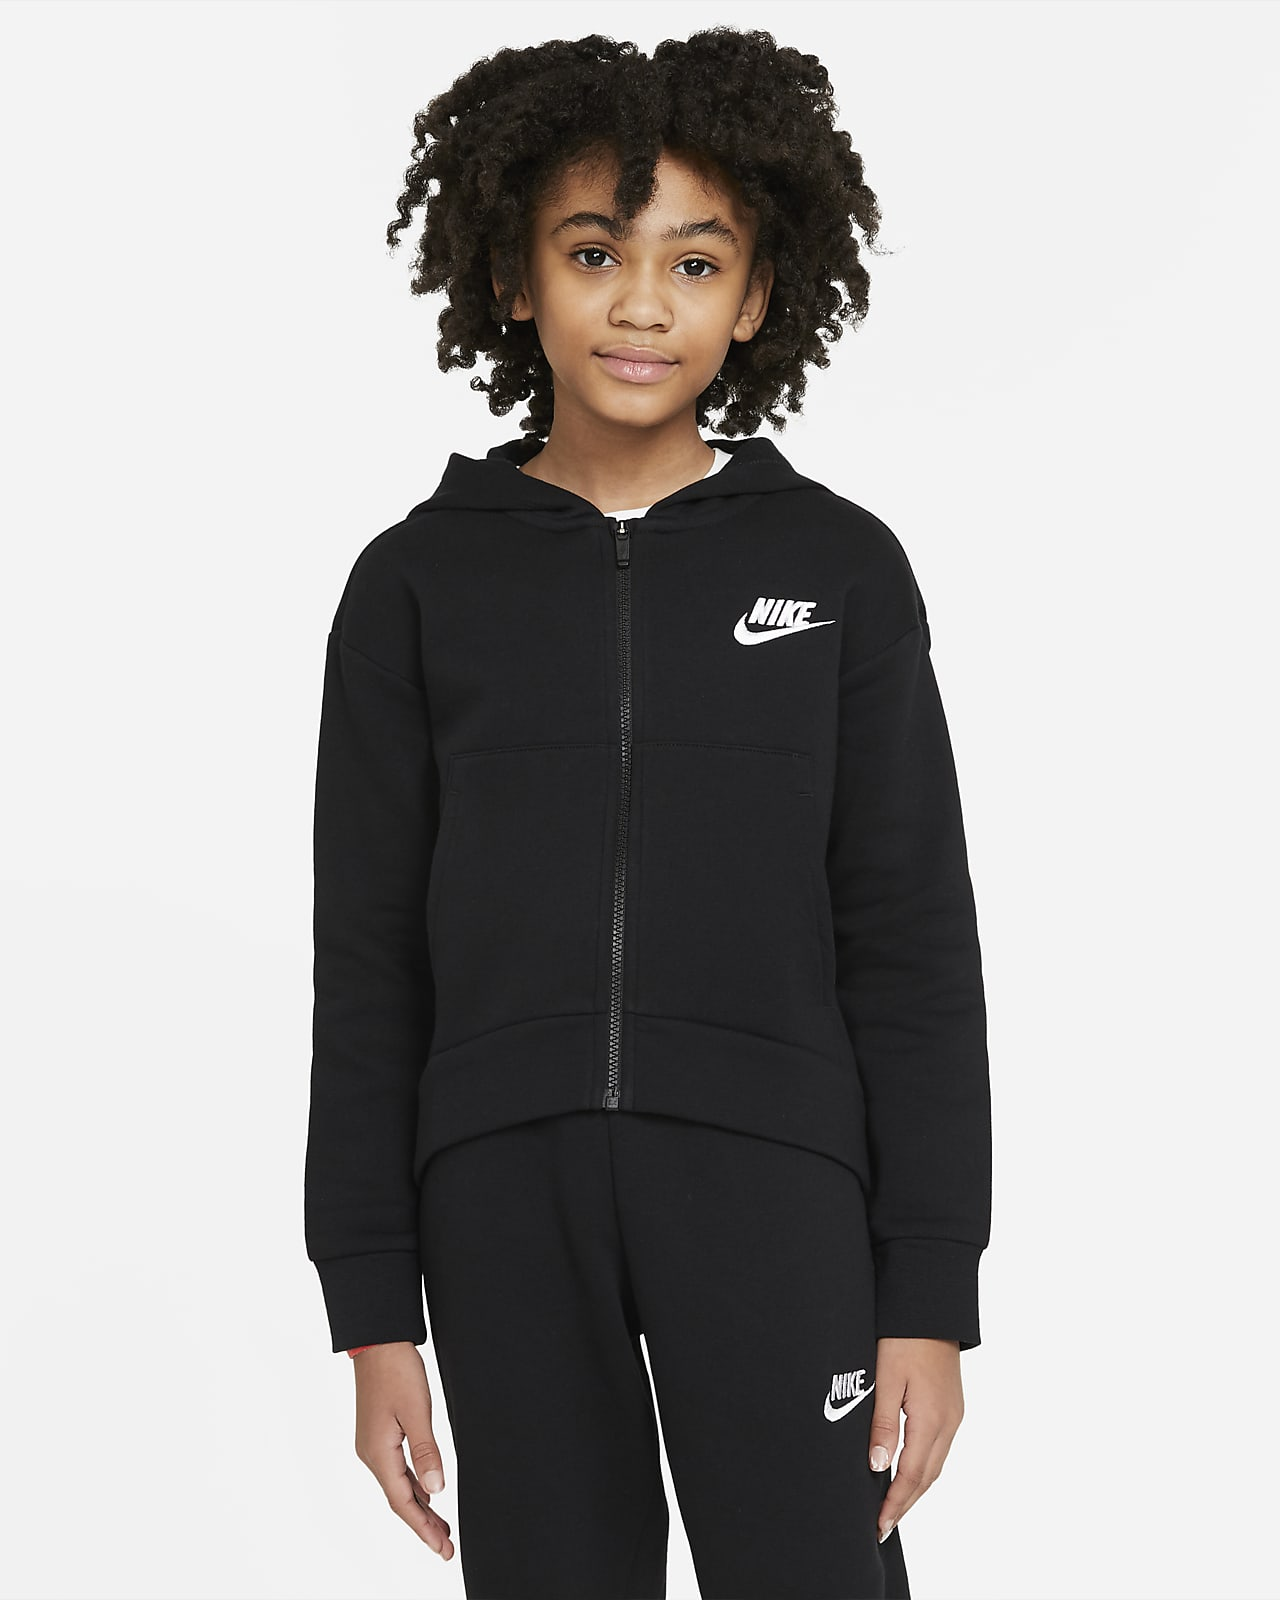 Nike Sportswear Club Fleece Sudadera con capucha con cremallera completa - Niña